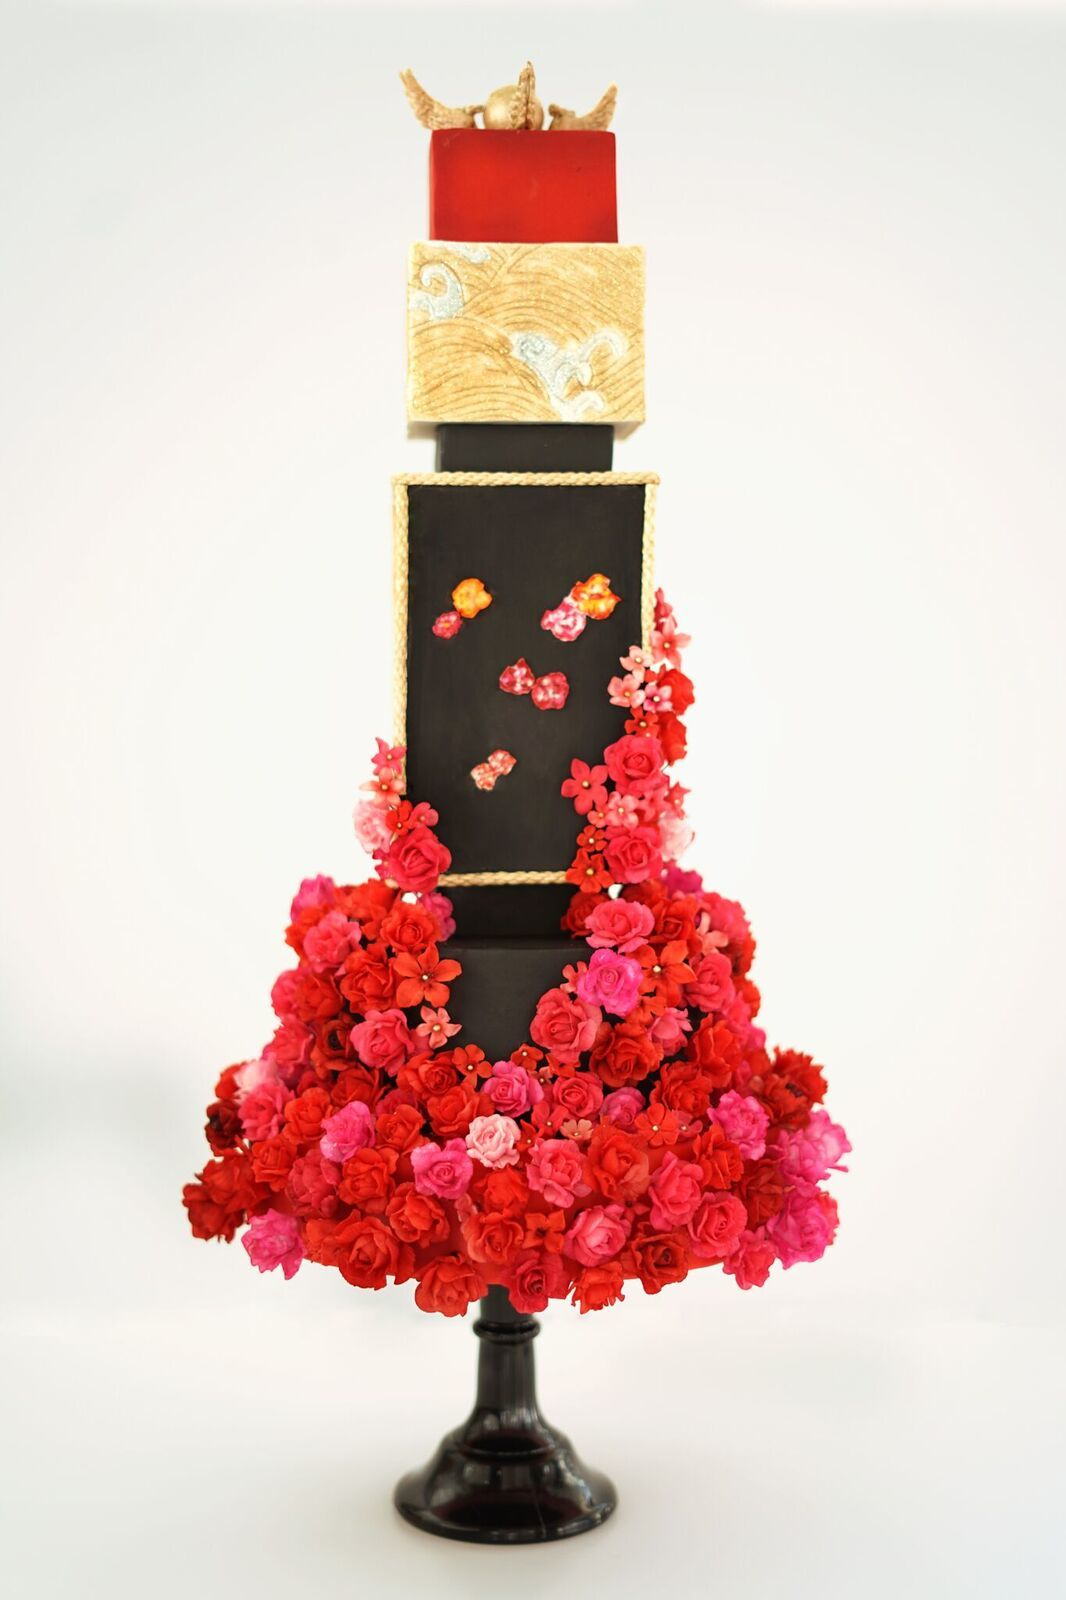 Brides-Around-the-World-Nuria-Moragrega-Cake-Mistress.jpeg#asset:13759